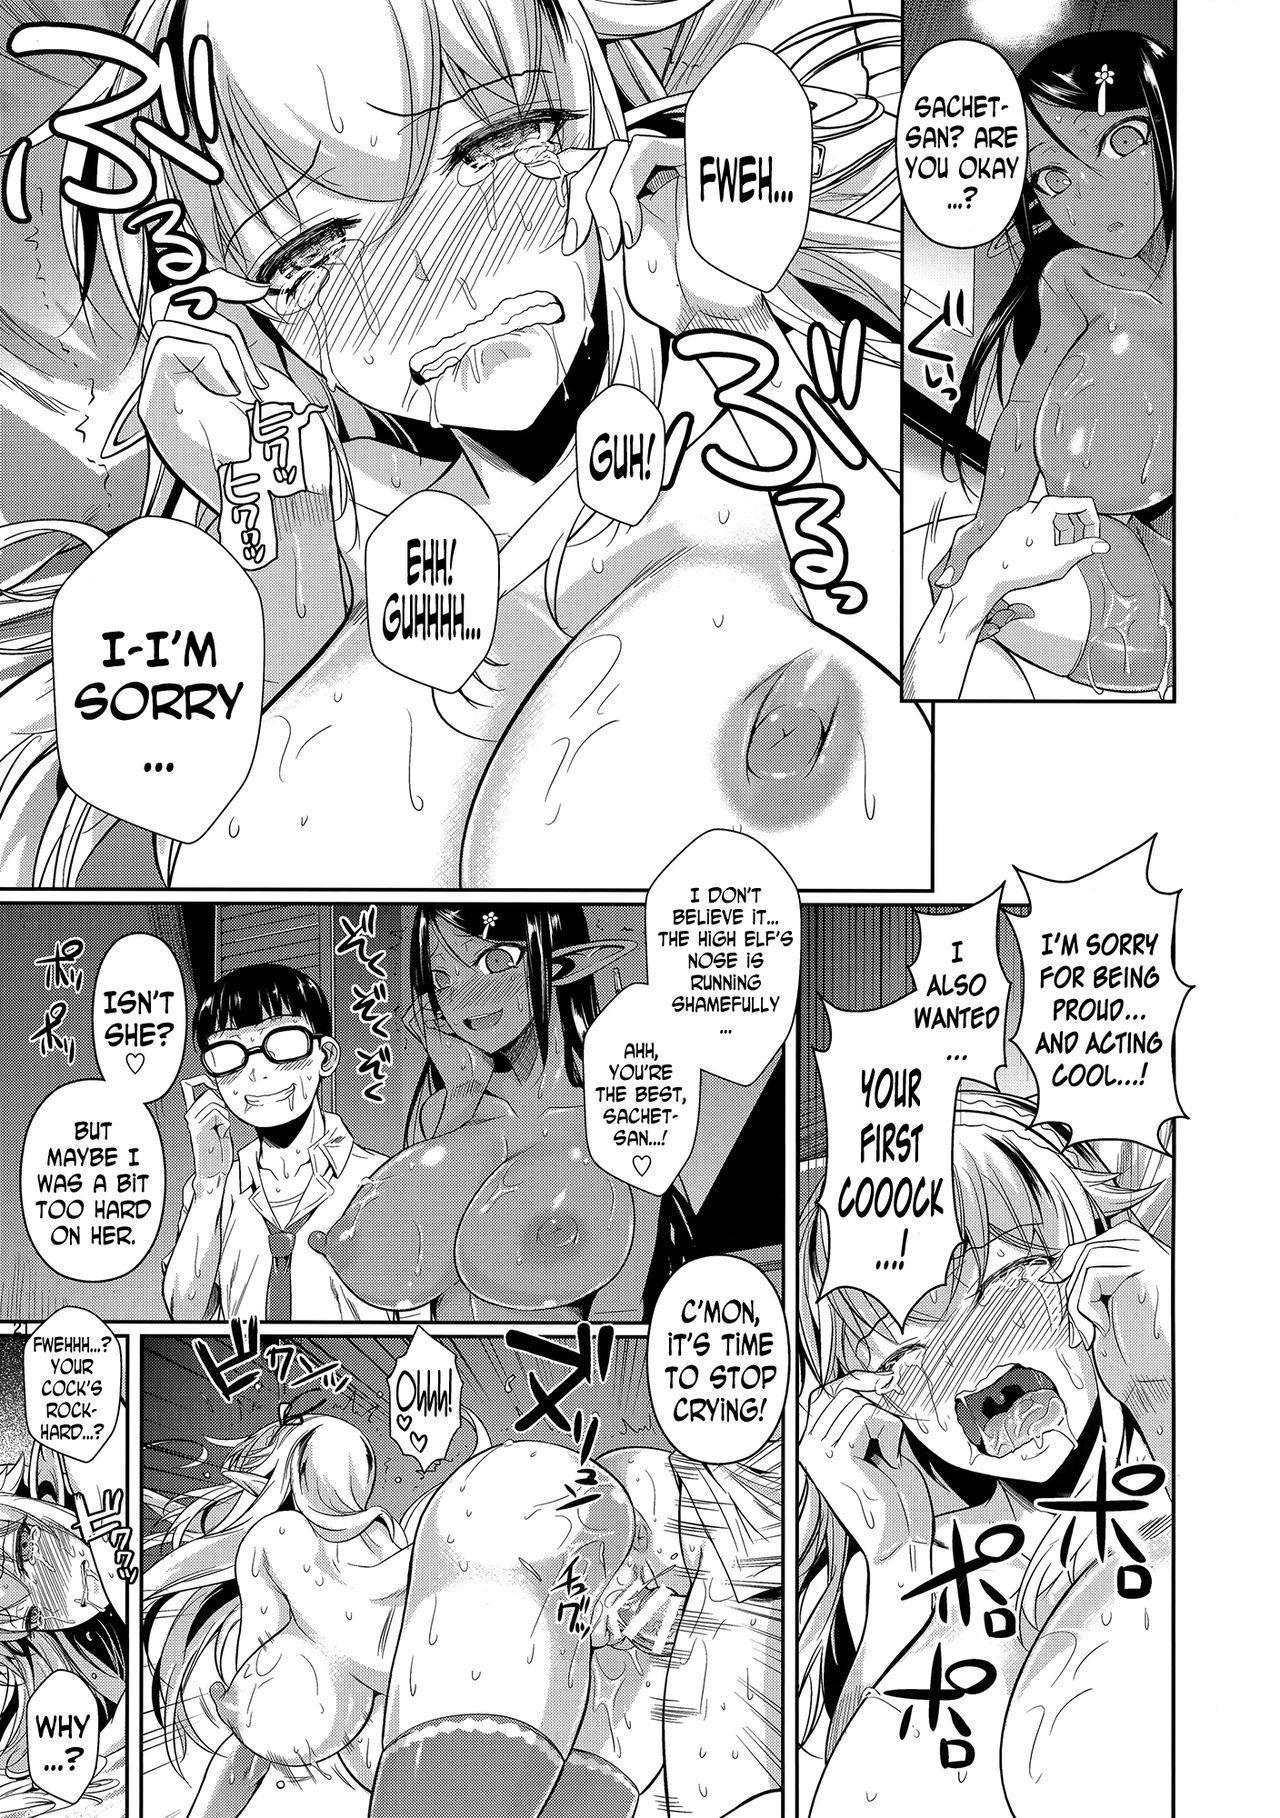 High Elf × High School Shiro × Kuro 21